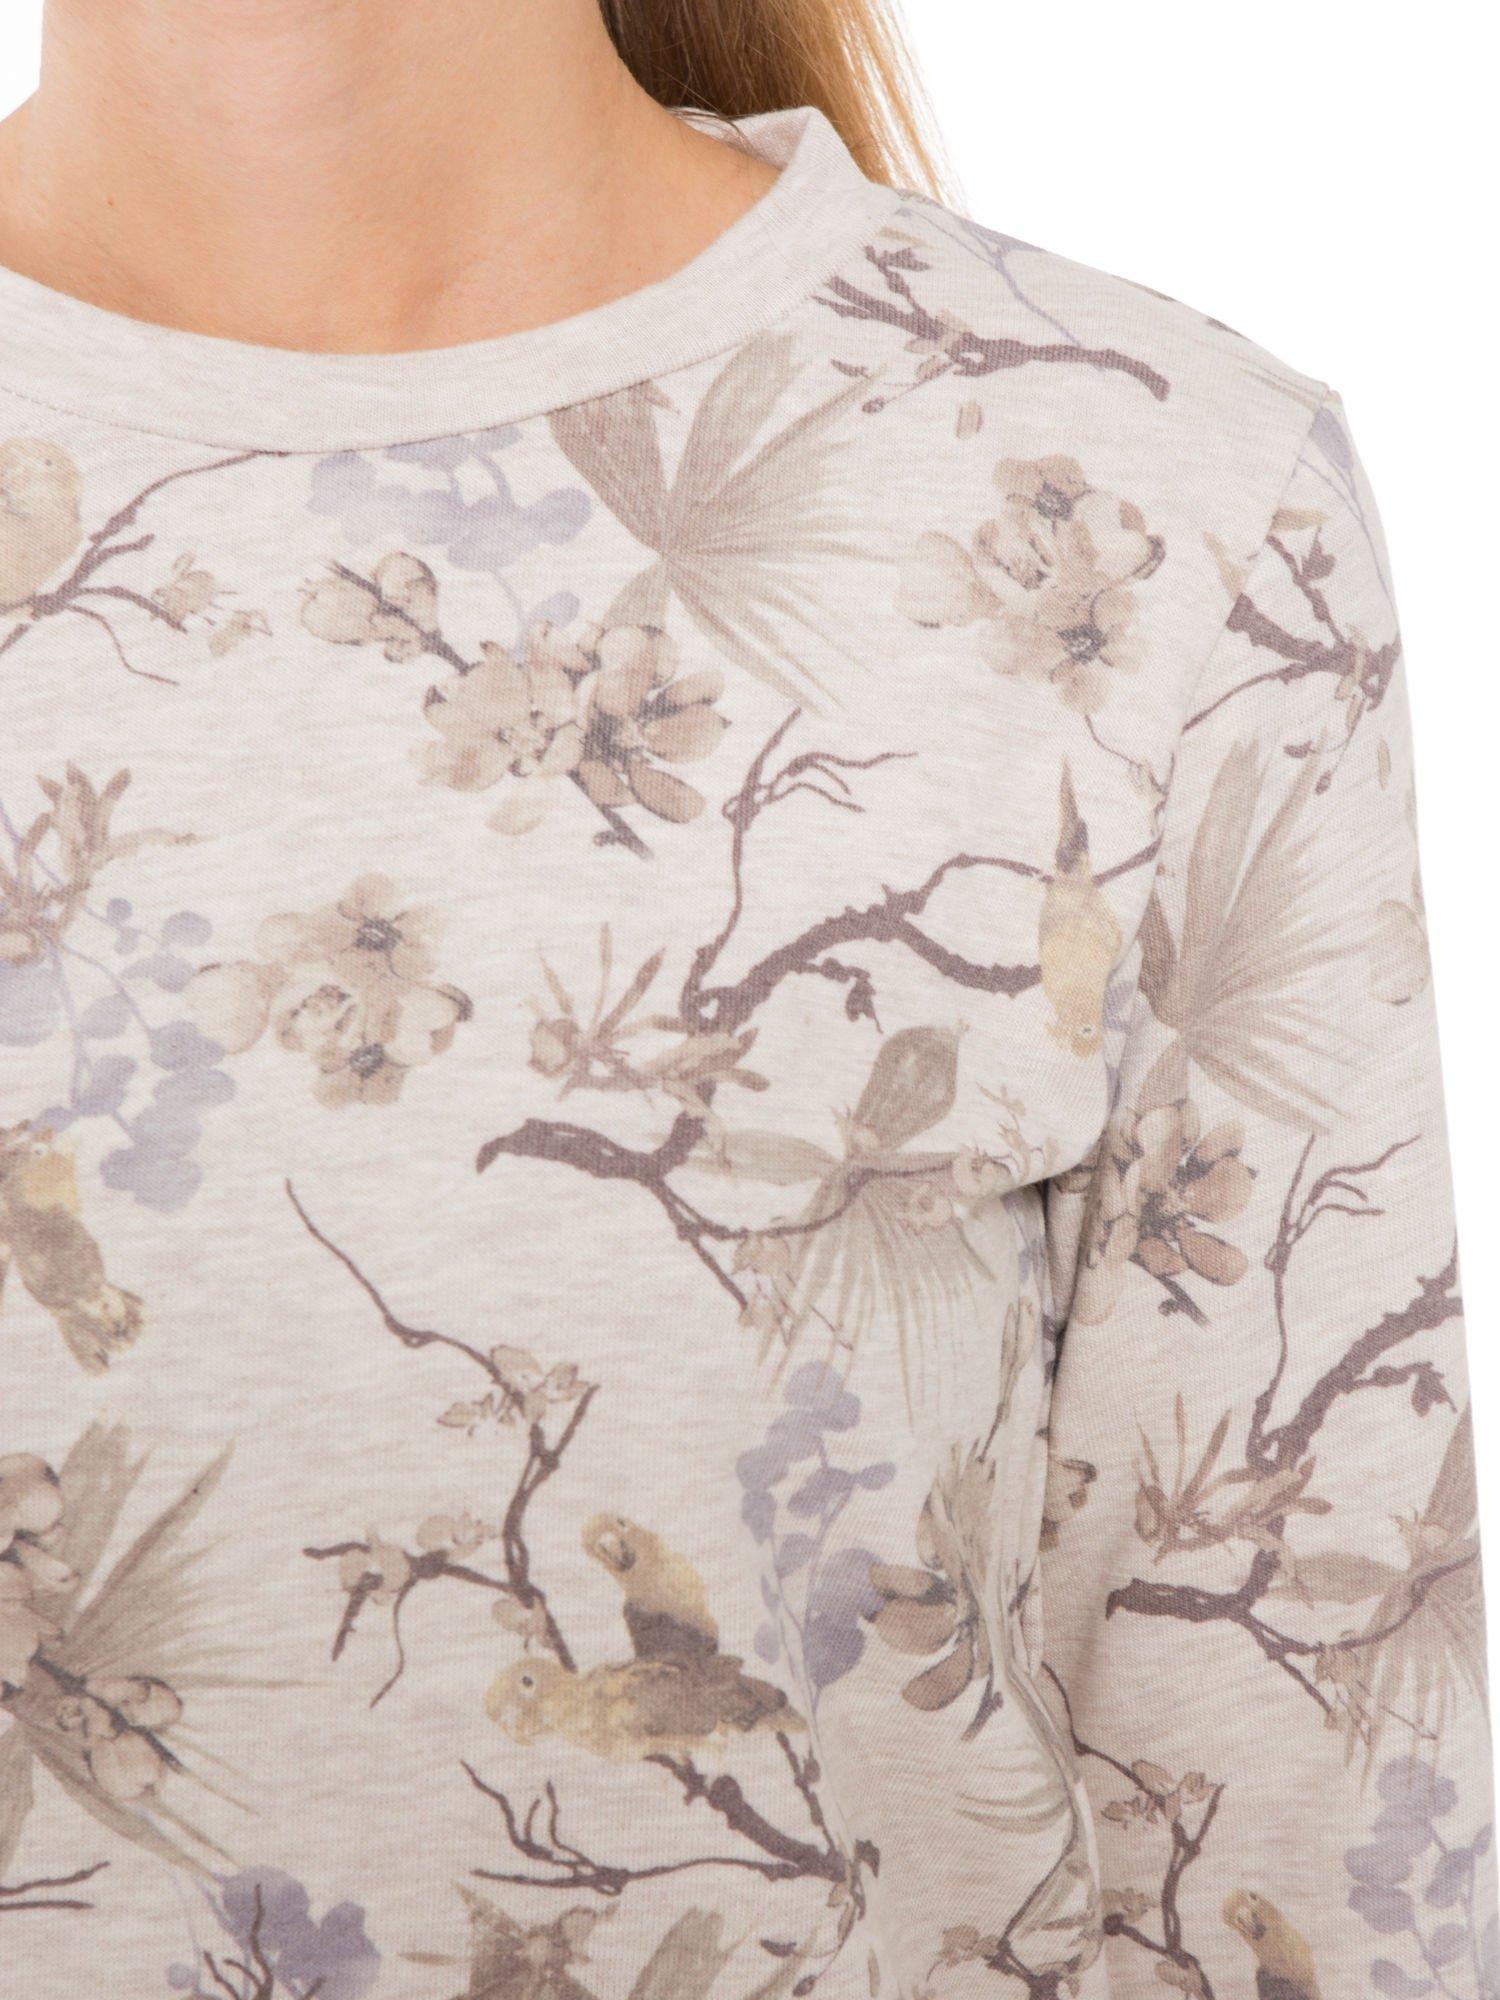 Beżowa bluza z nadrukiem all over floral print                                  zdj.                                  5